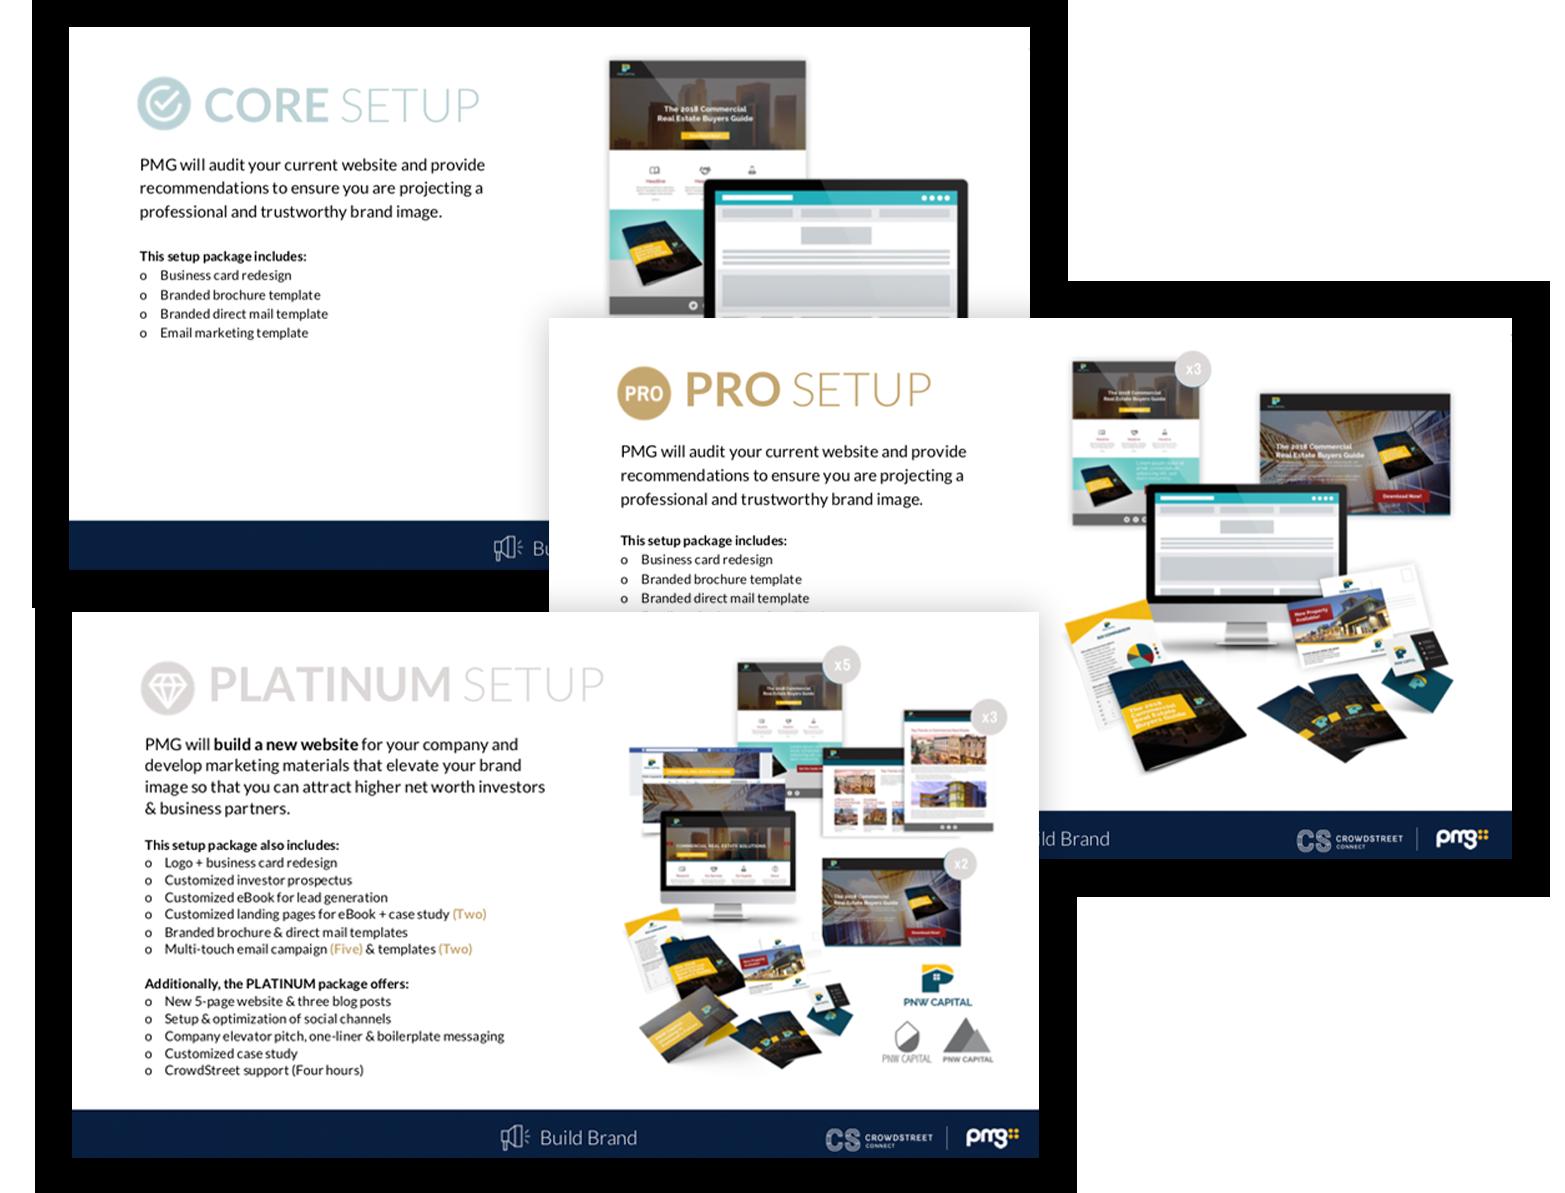 Partner Program tier examples